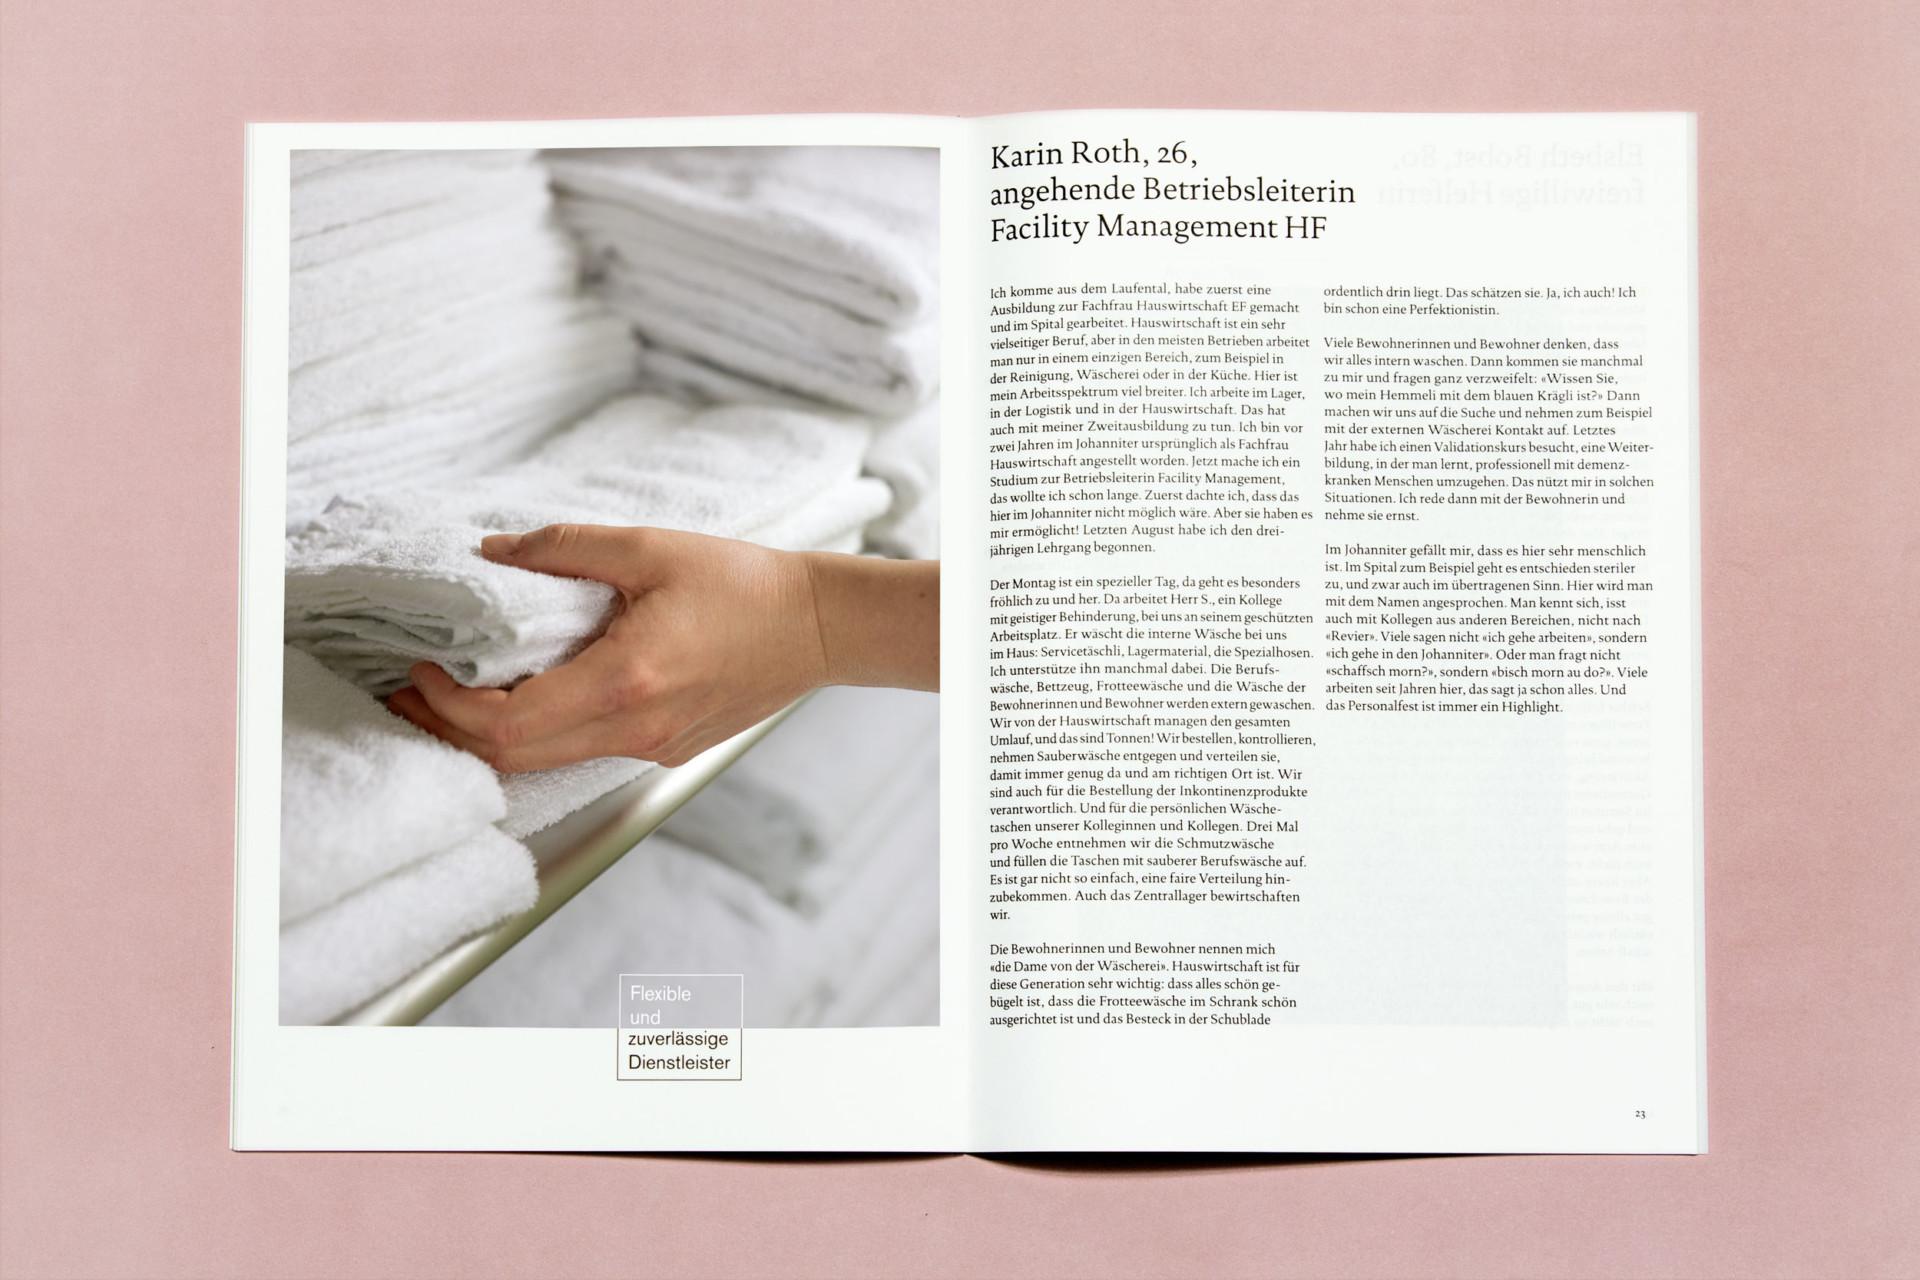 BKVK 30 Jahre Johanniter — Jubiläumsbroschüre